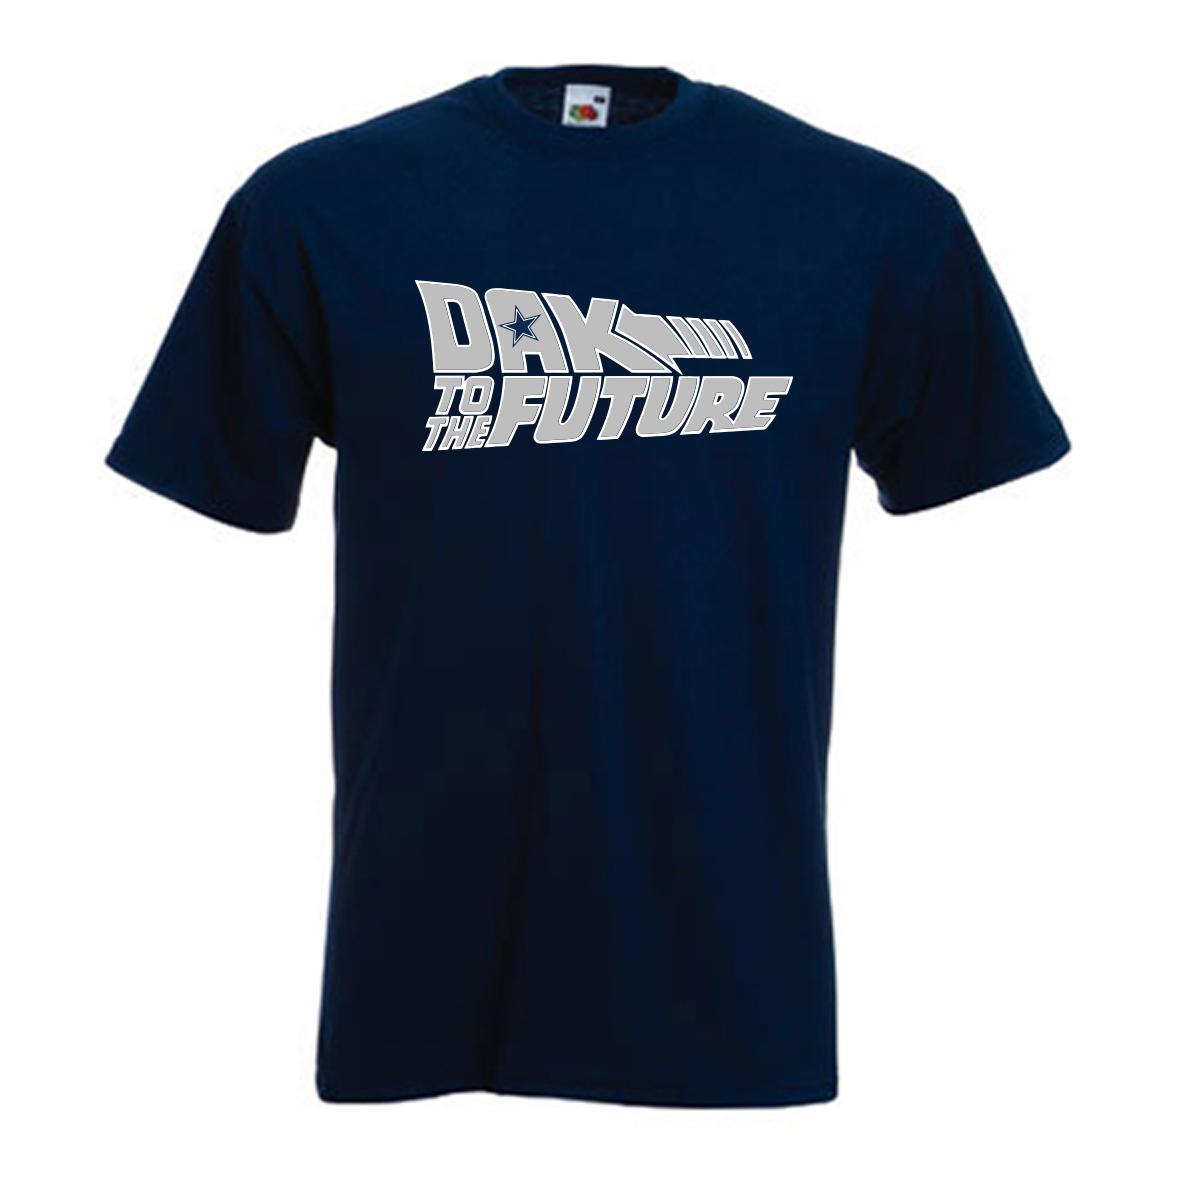 "Shedd Shirts Navy Dak Prescottt Dallas Cowboys ""Dak to the Future"" Youth Medium T-Shirt"